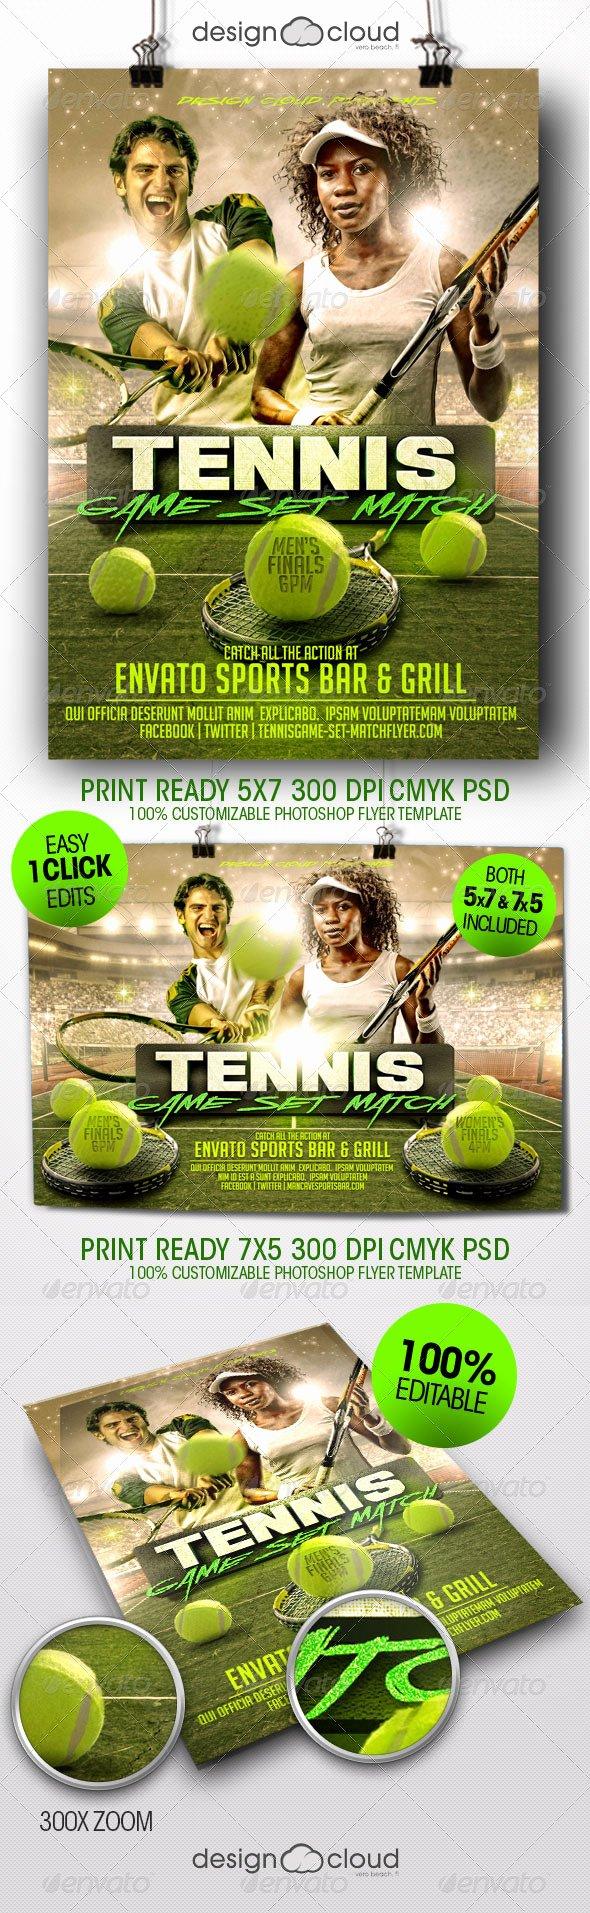 Tennis Flyer Template Free Elegant Tennis Game Set Match Flyer Template by Design Cloud